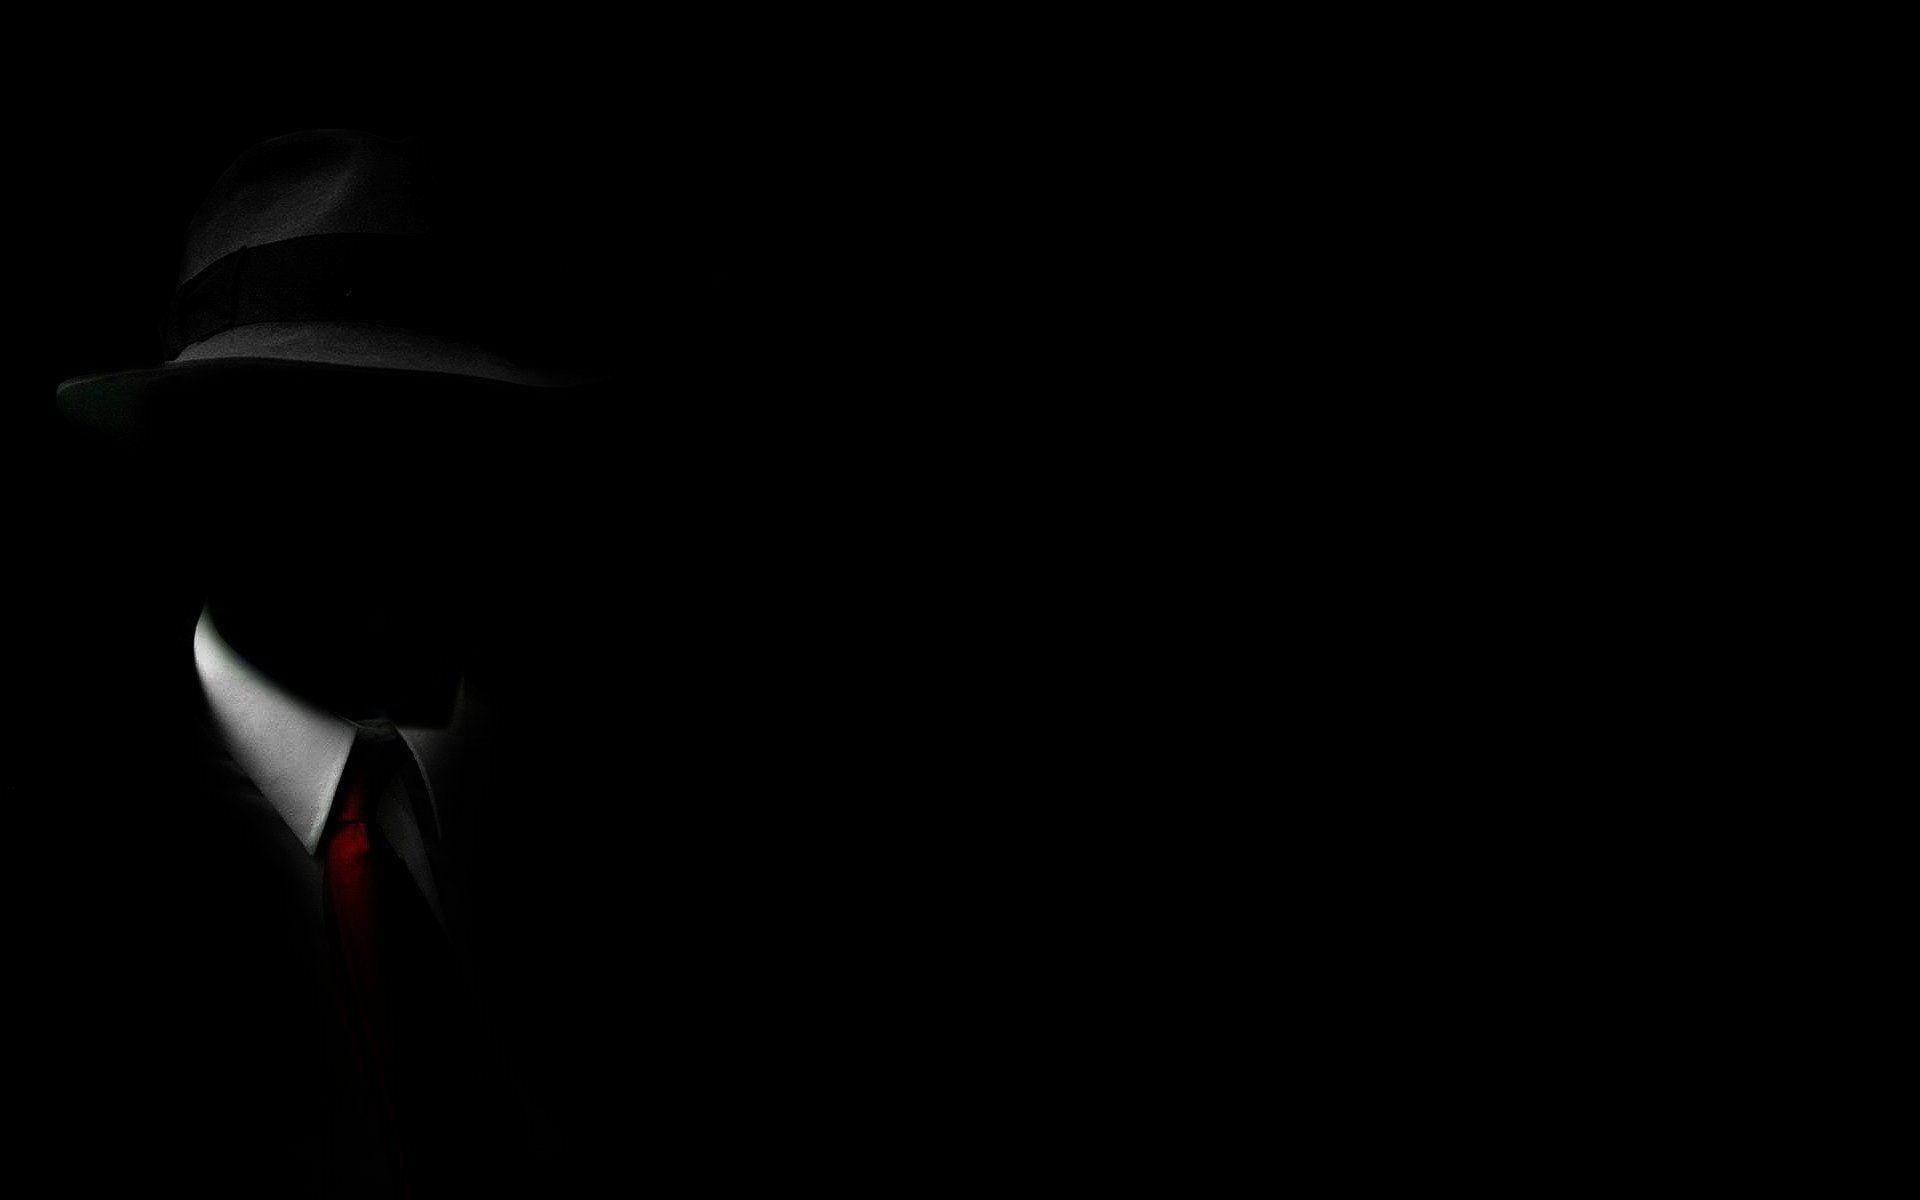 Mafia Wallpapers – Full HD wallpaper search – page 2